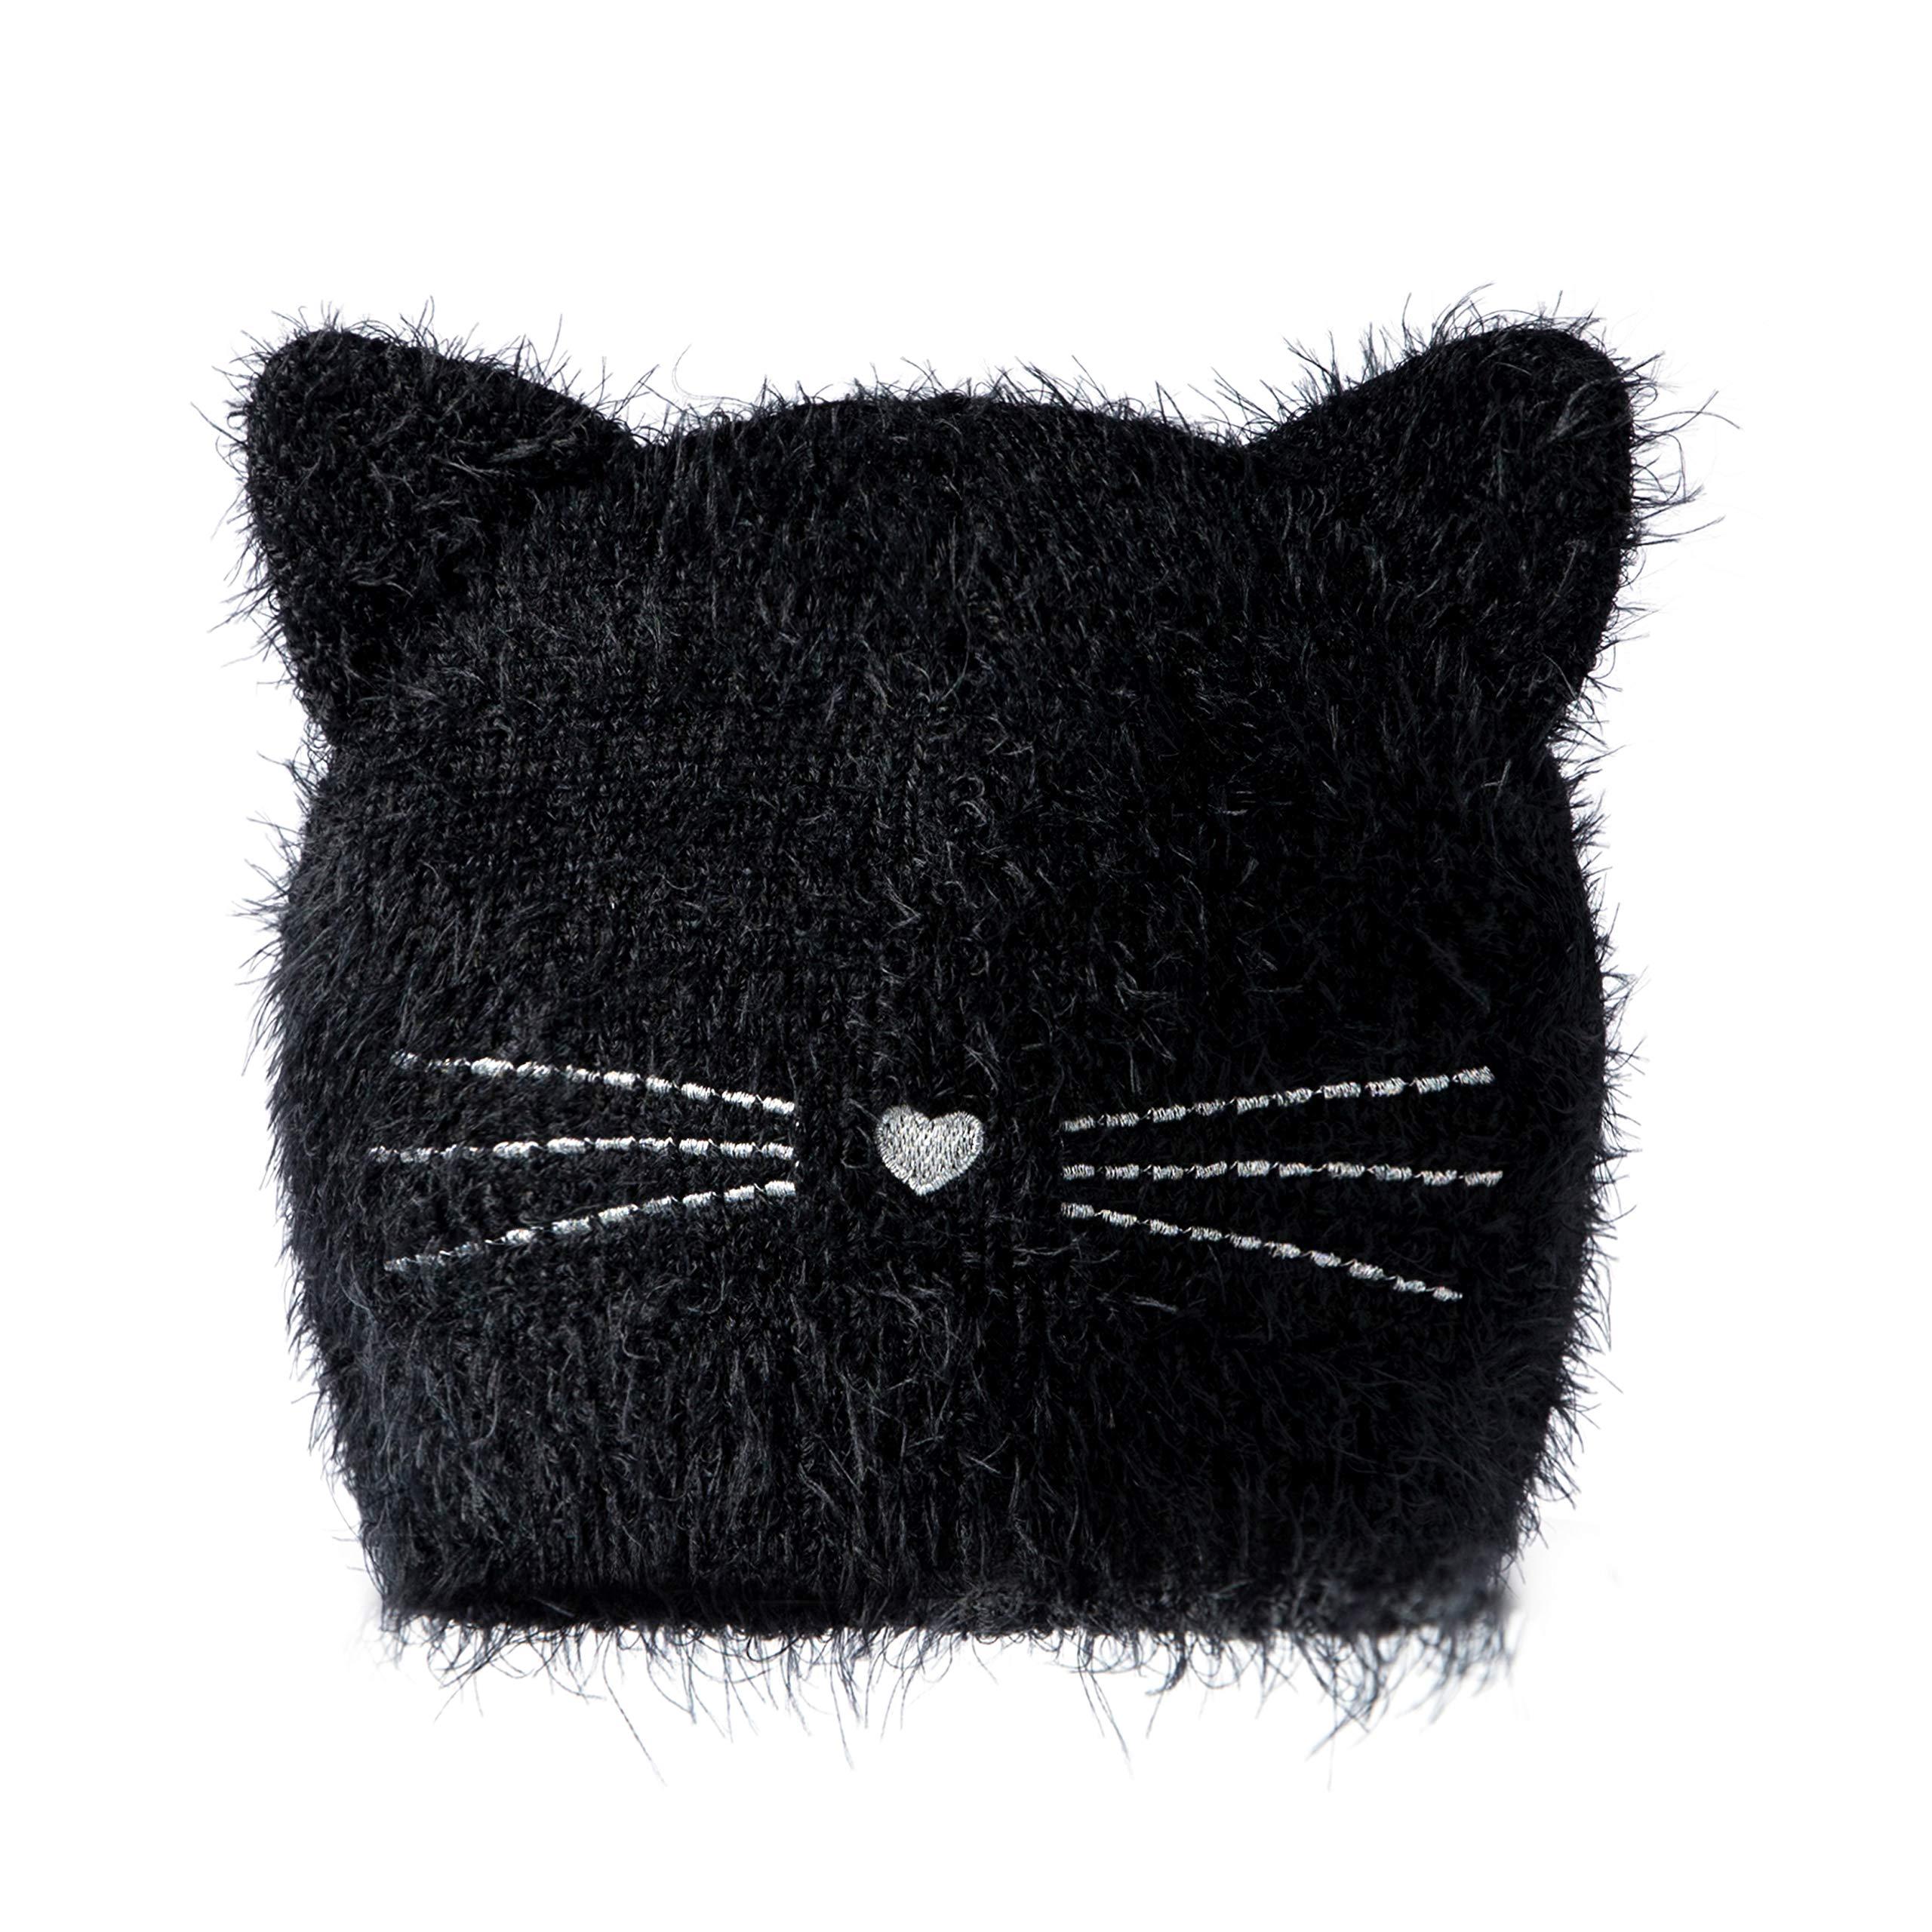 Cat - Doorstop, Stuffed Toy - Crochet Pattern | 2560x2560